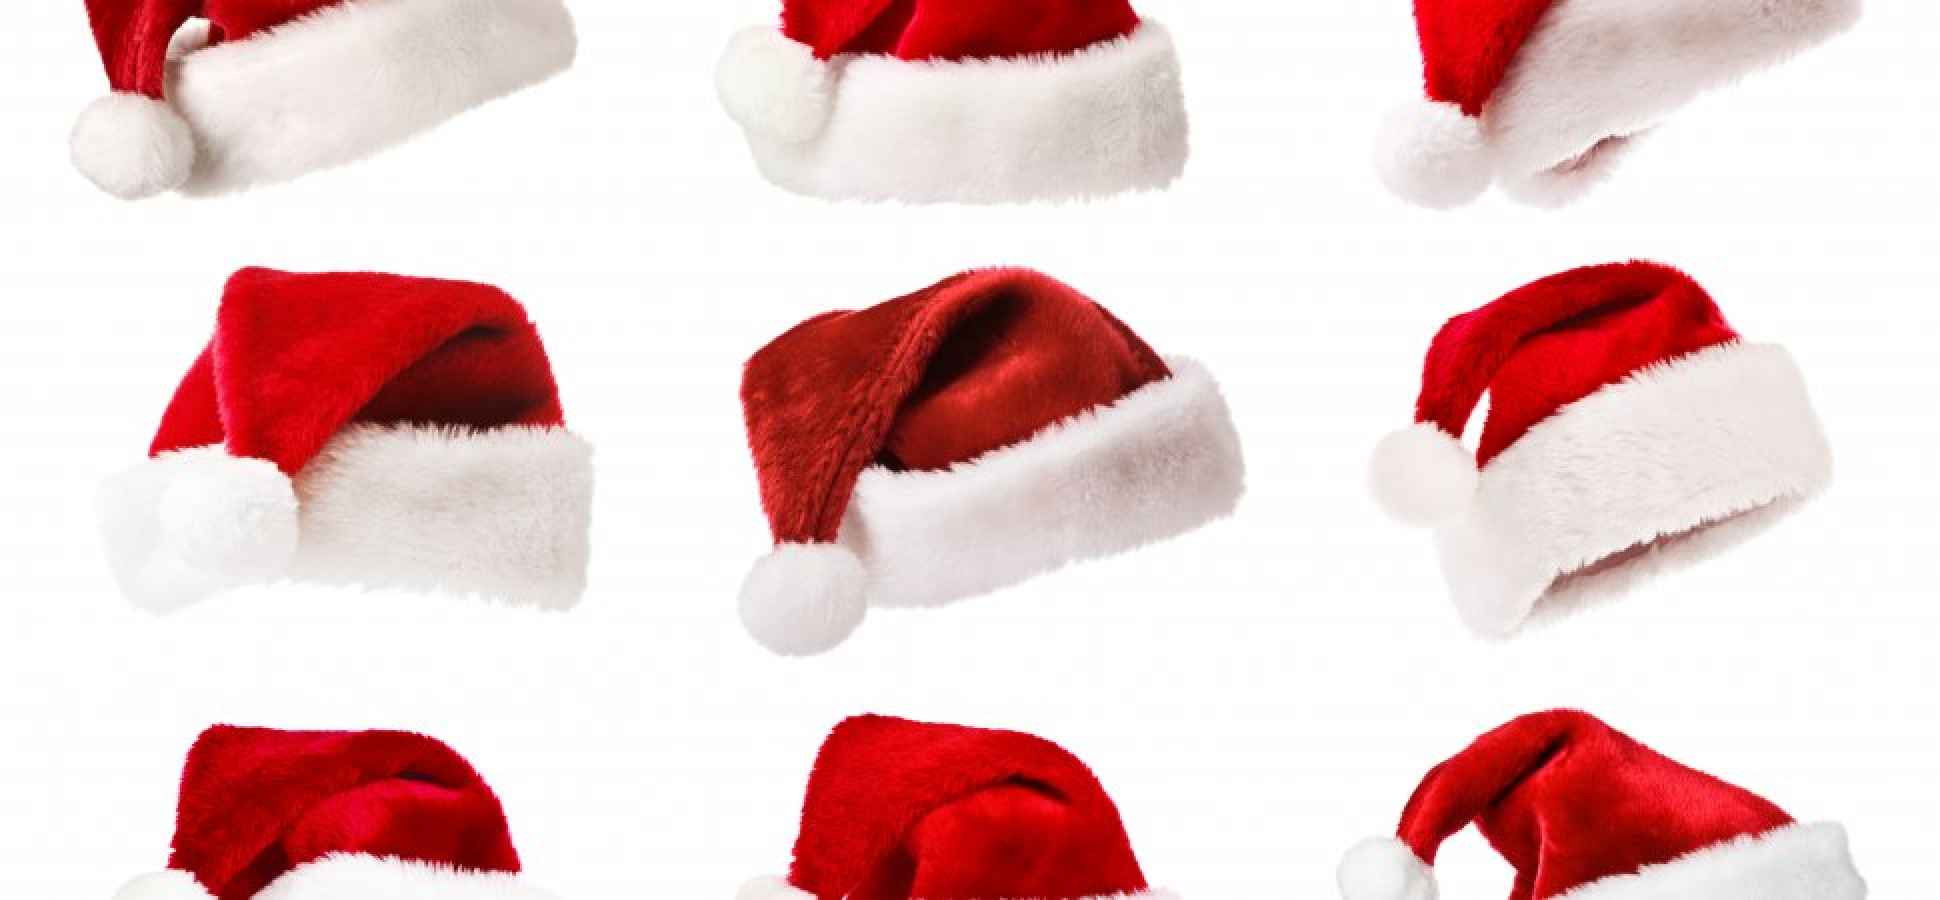 Holly Jolly Leadership Lessons From Santa (Seriously)